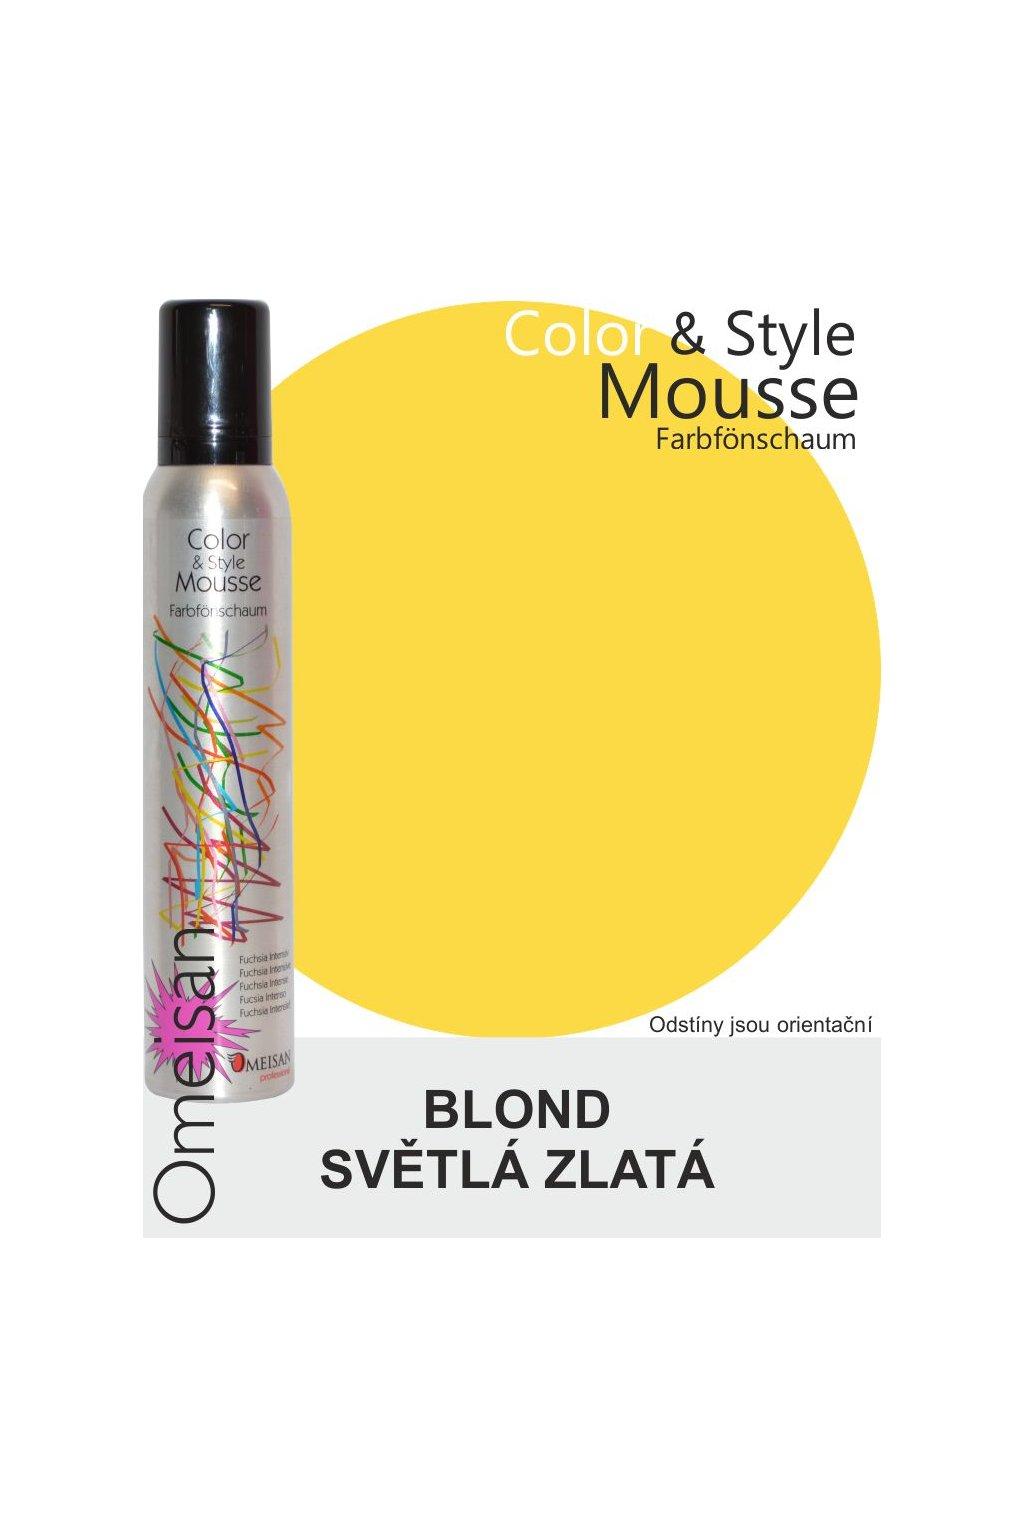 6431 omeisan barevna pena tuzici hellgoldblond 200ml blond svetla zlata